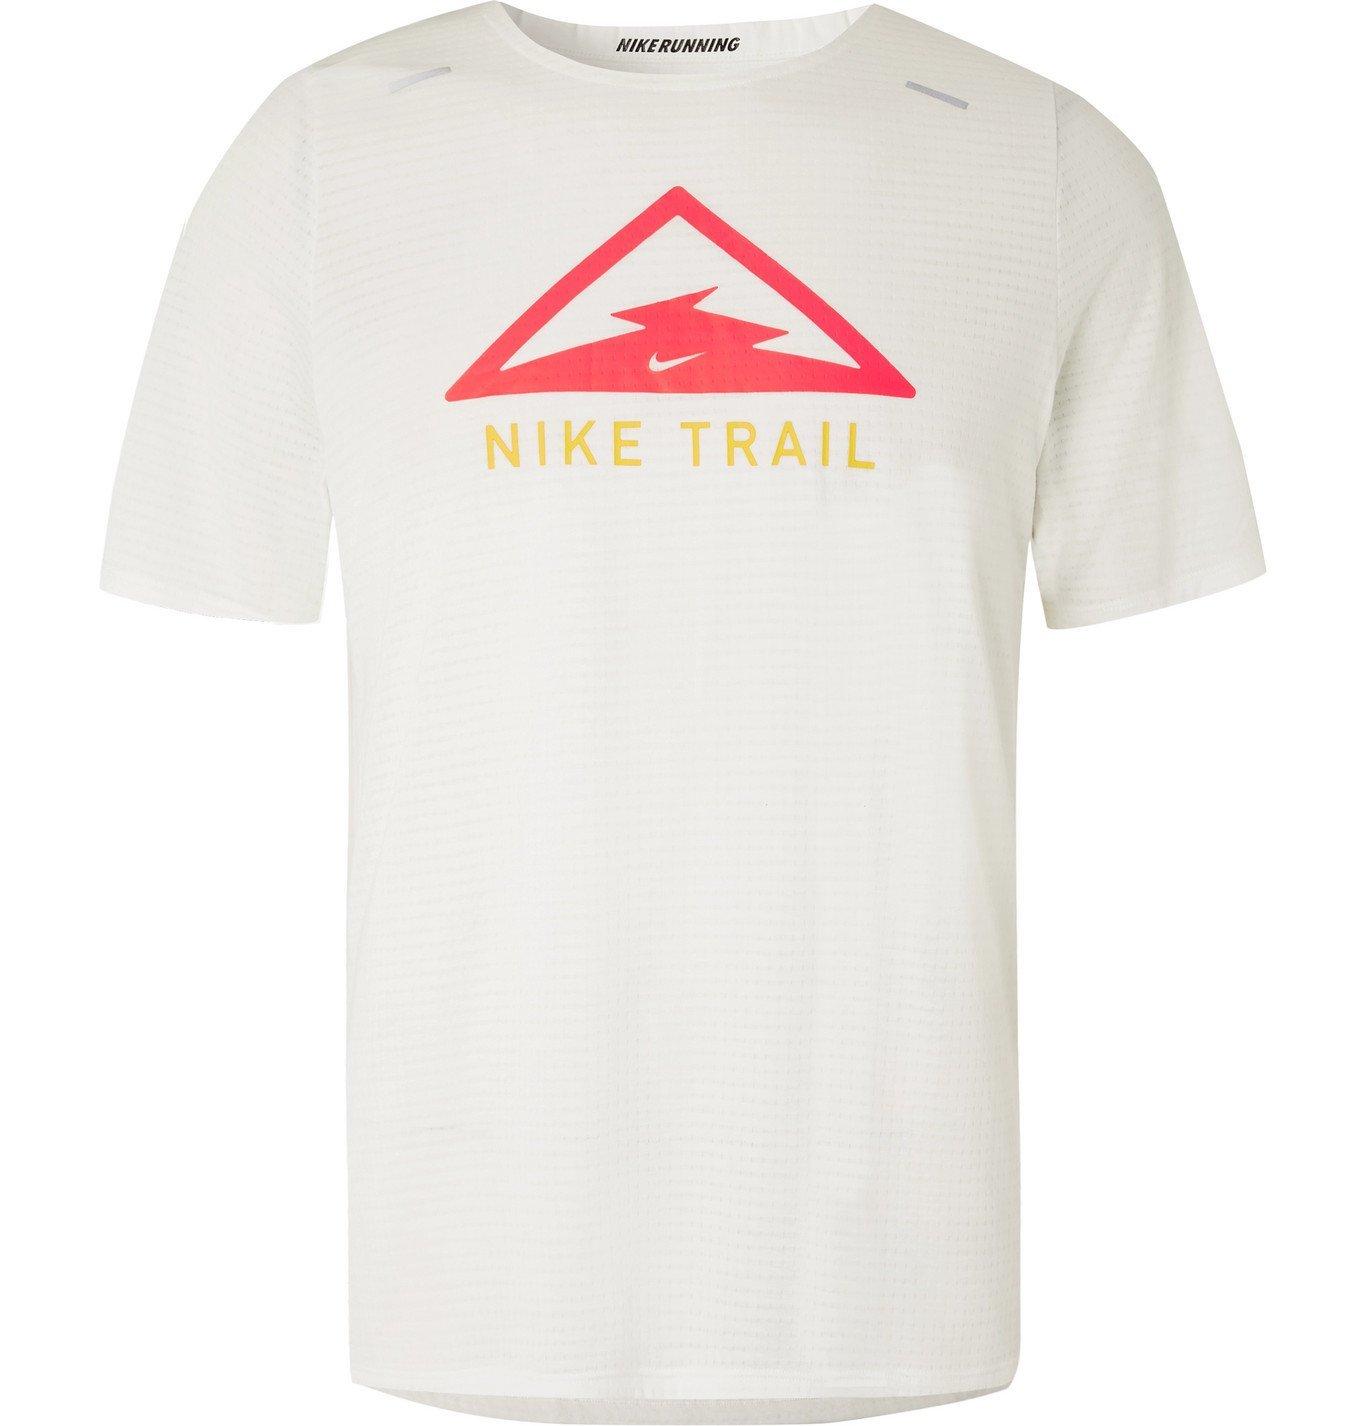 Nike Running - Rise 365 Trail Logo-Print Dri-FIT T-Shirt - White